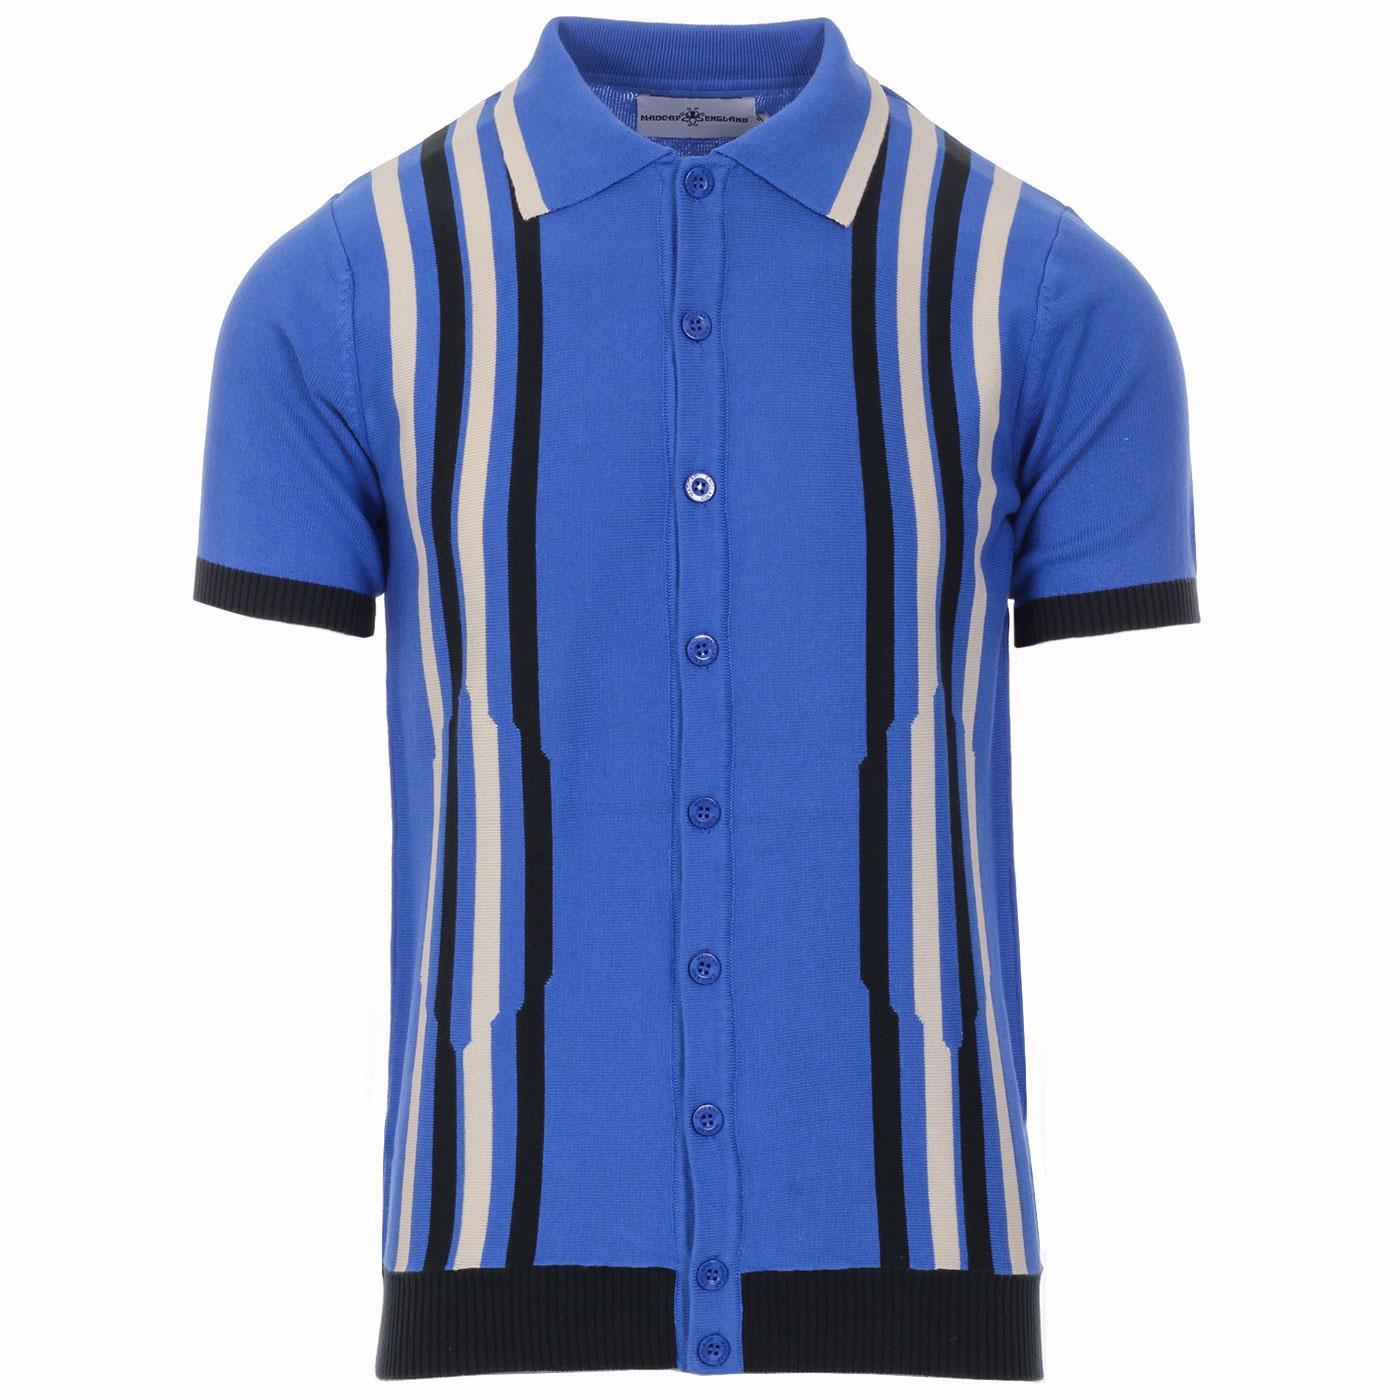 Shockwave MADCAP ENGLAND Mod Stripe Knit Polo (AB)